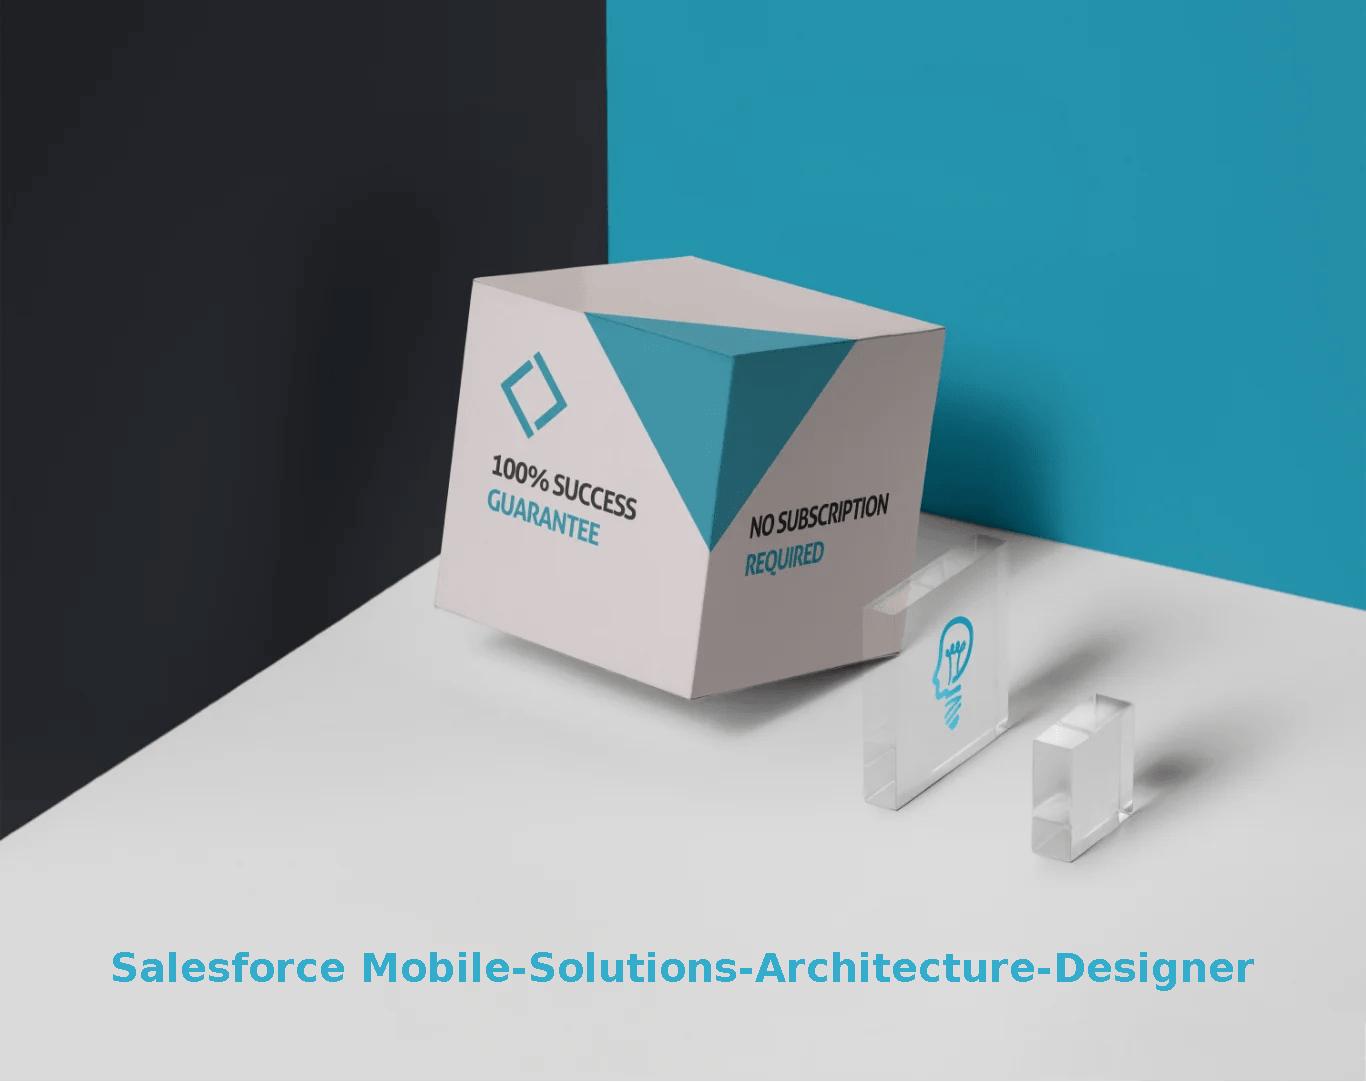 Mobile-Solutions-Architecture-Designer Dumps